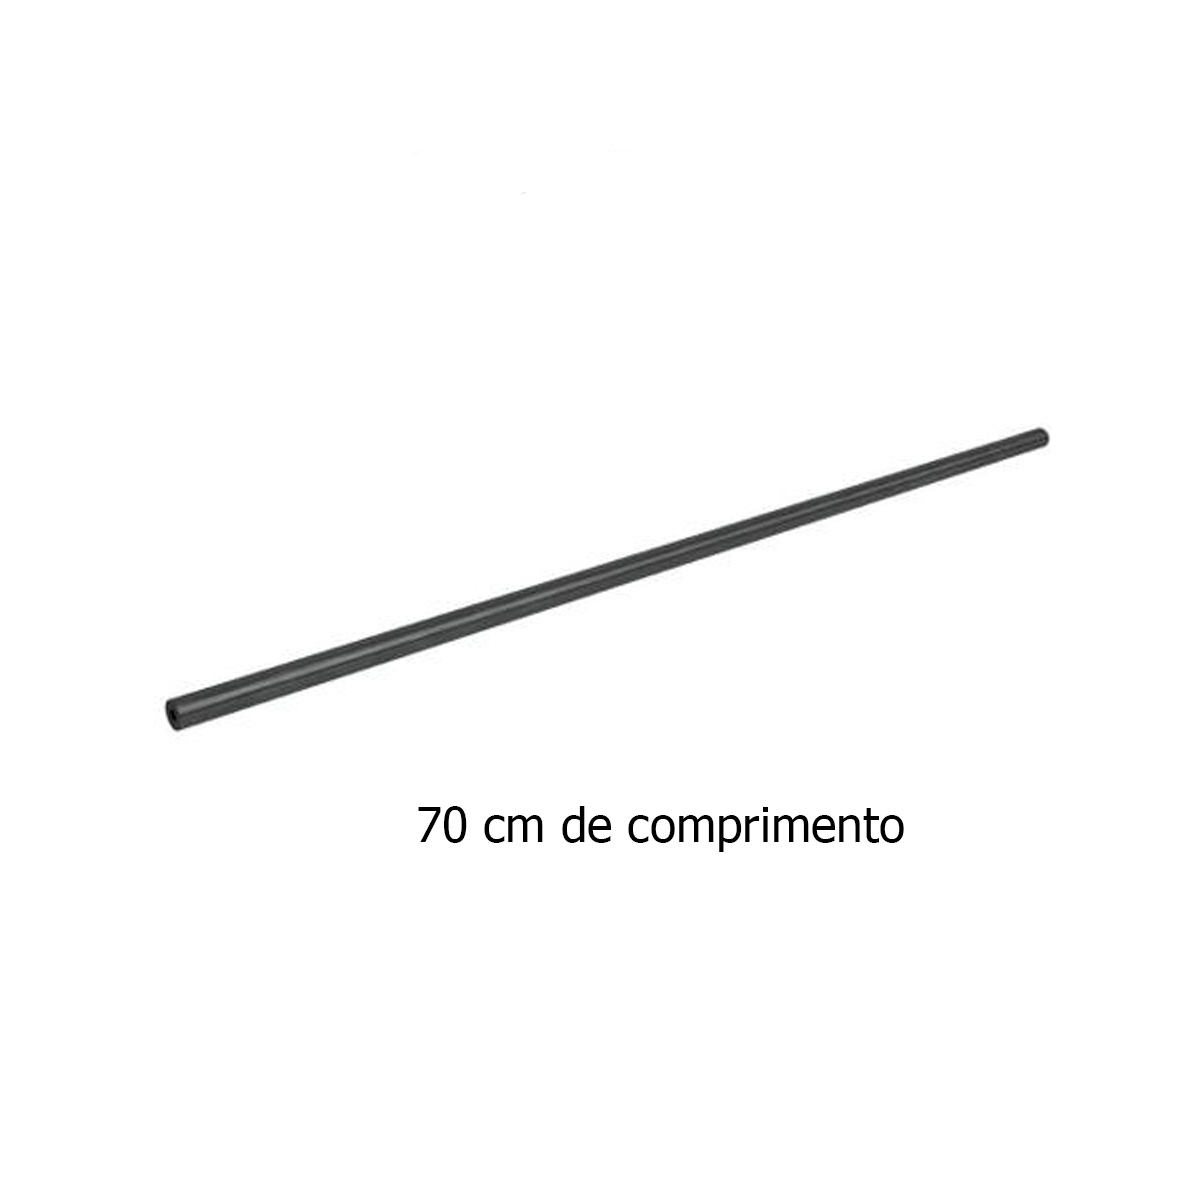 Cano Fiora 5.5 mm 70 cm s/ Bloco  - Pró Pesca Shop